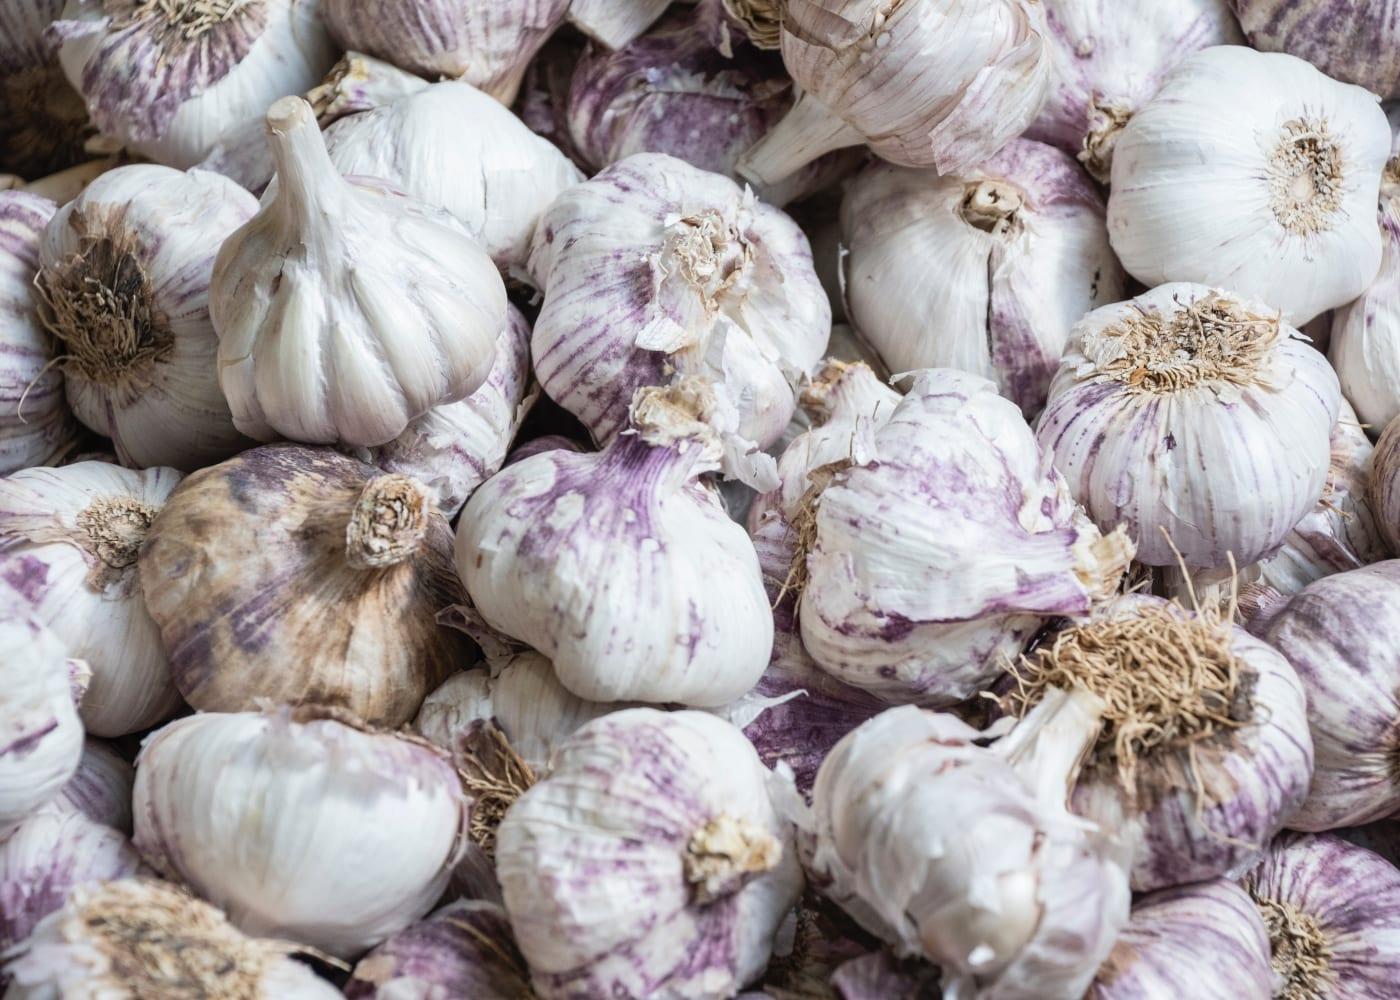 eating garlic prevents coronavirus | myths about COVID-19